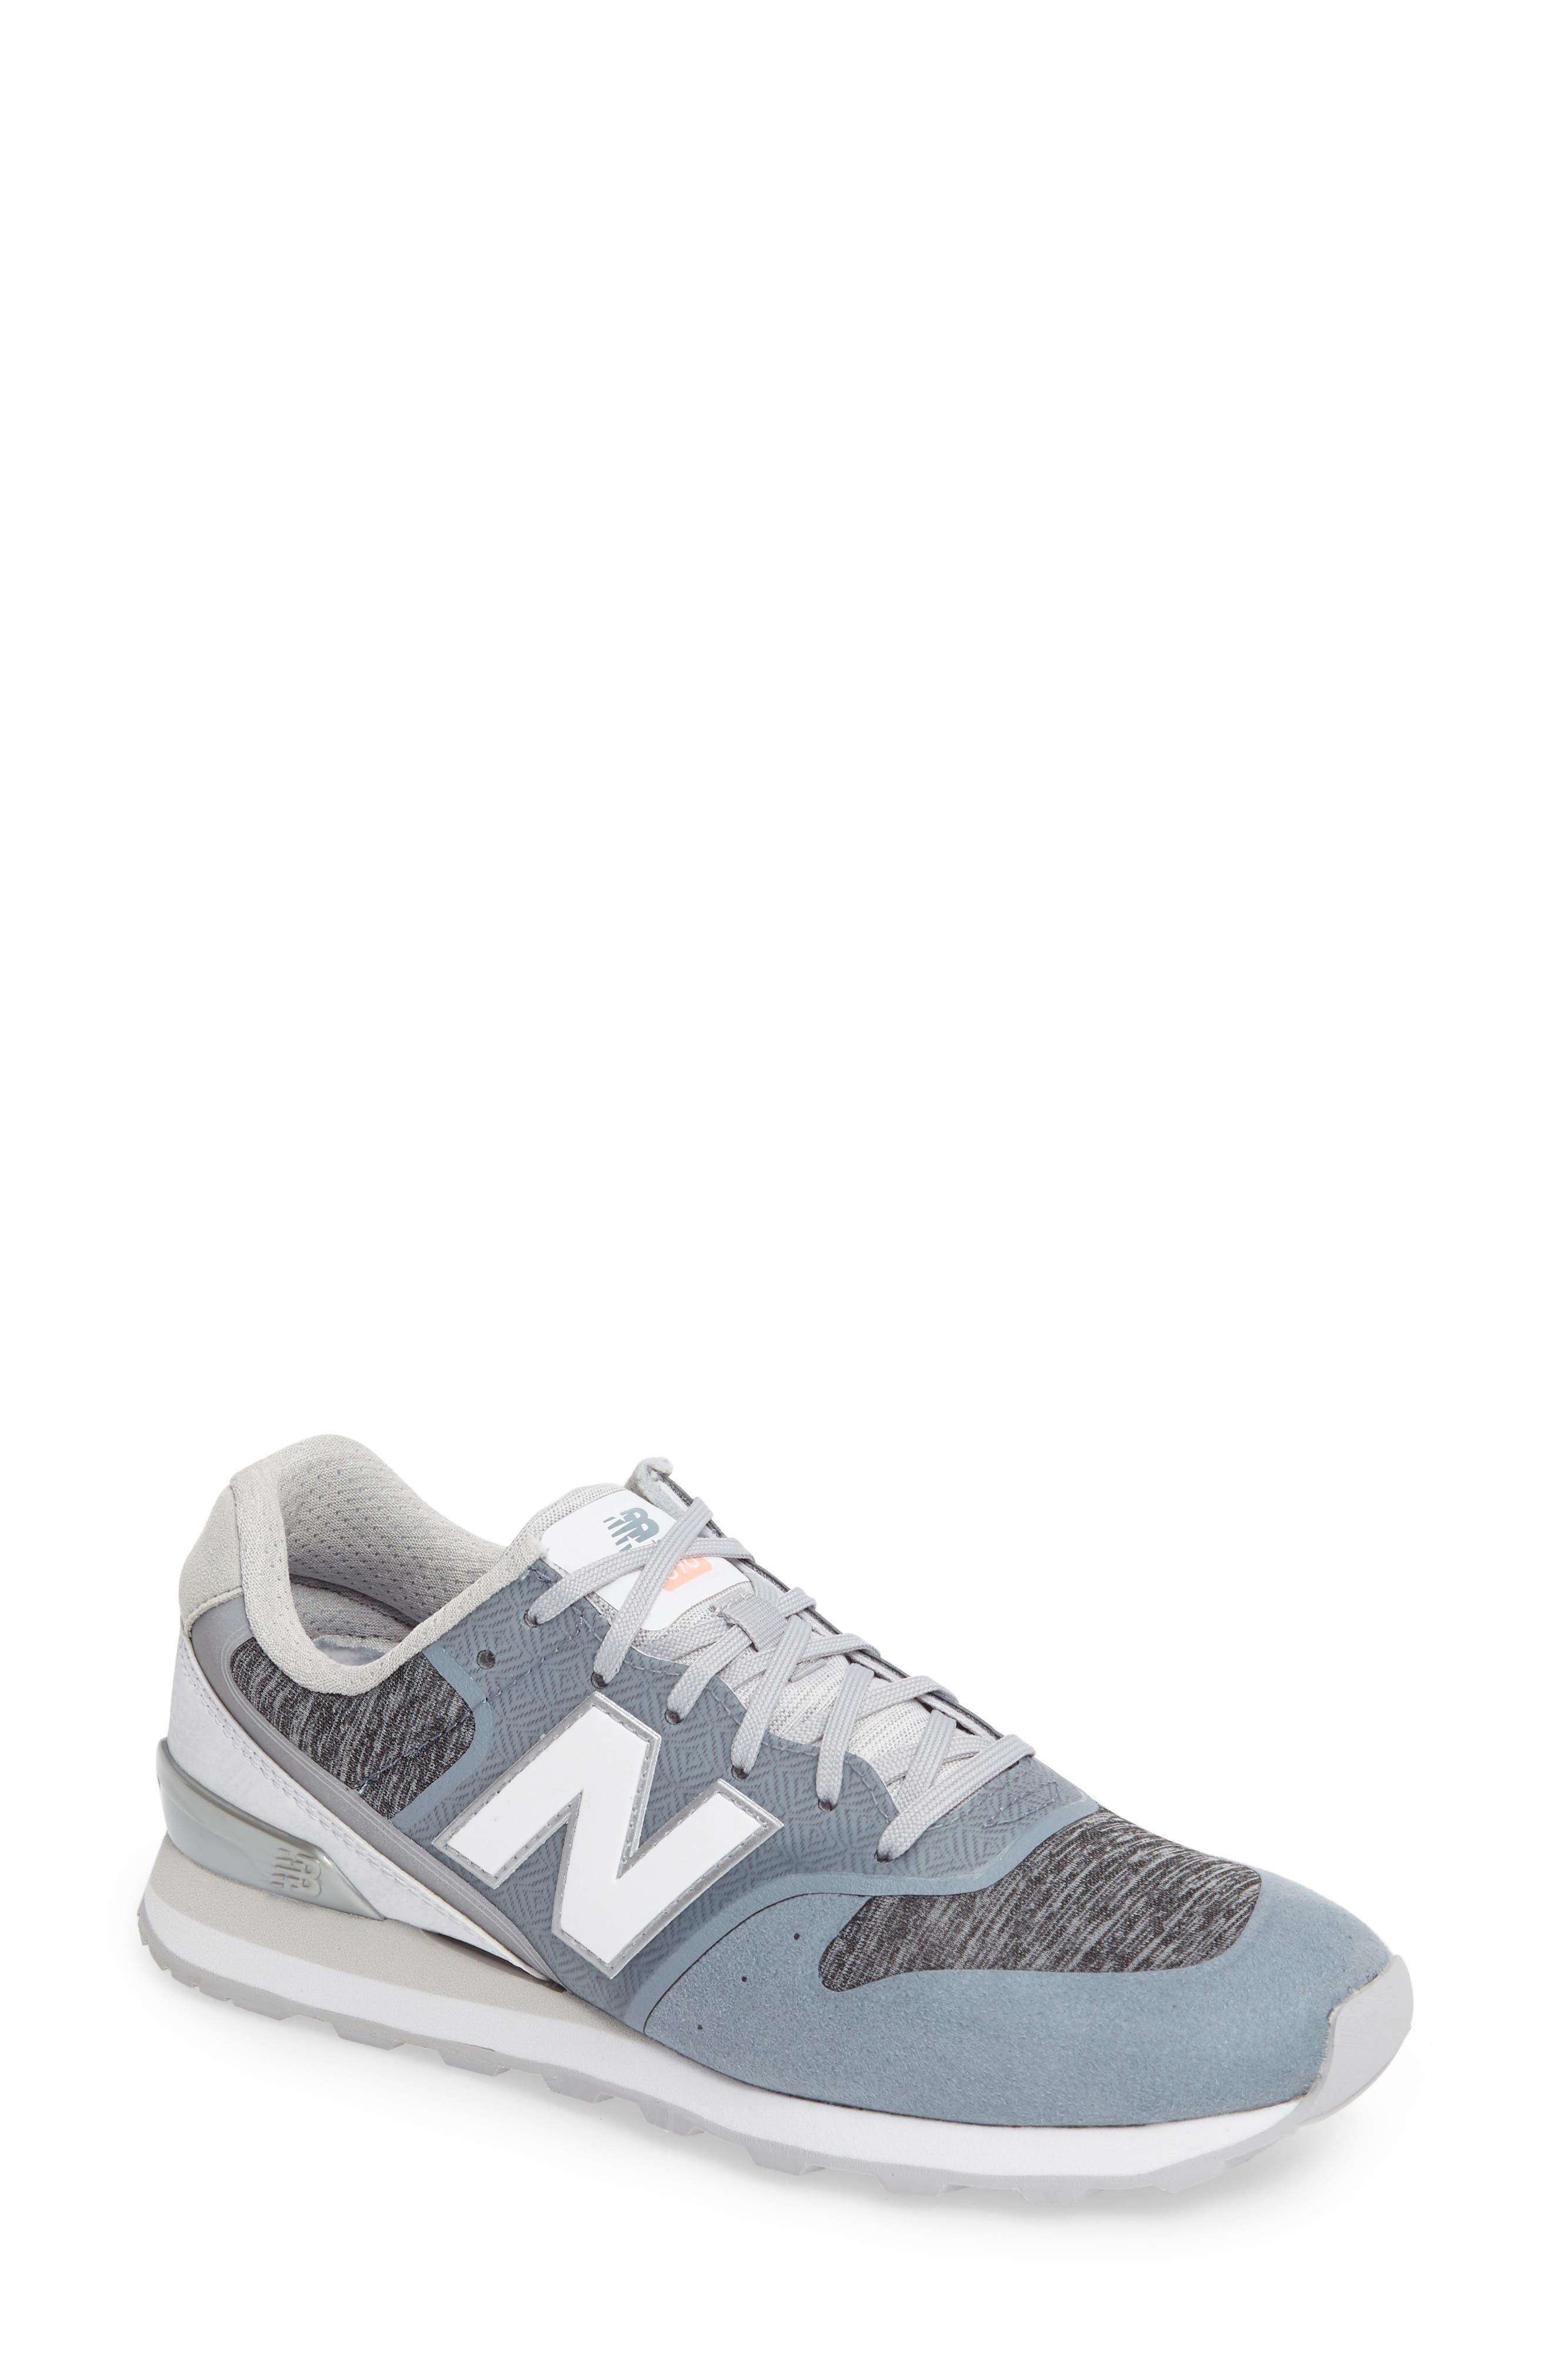 Alternate Image 1 Selected - New Balance 696 Re-Engineered Sneaker (Women)